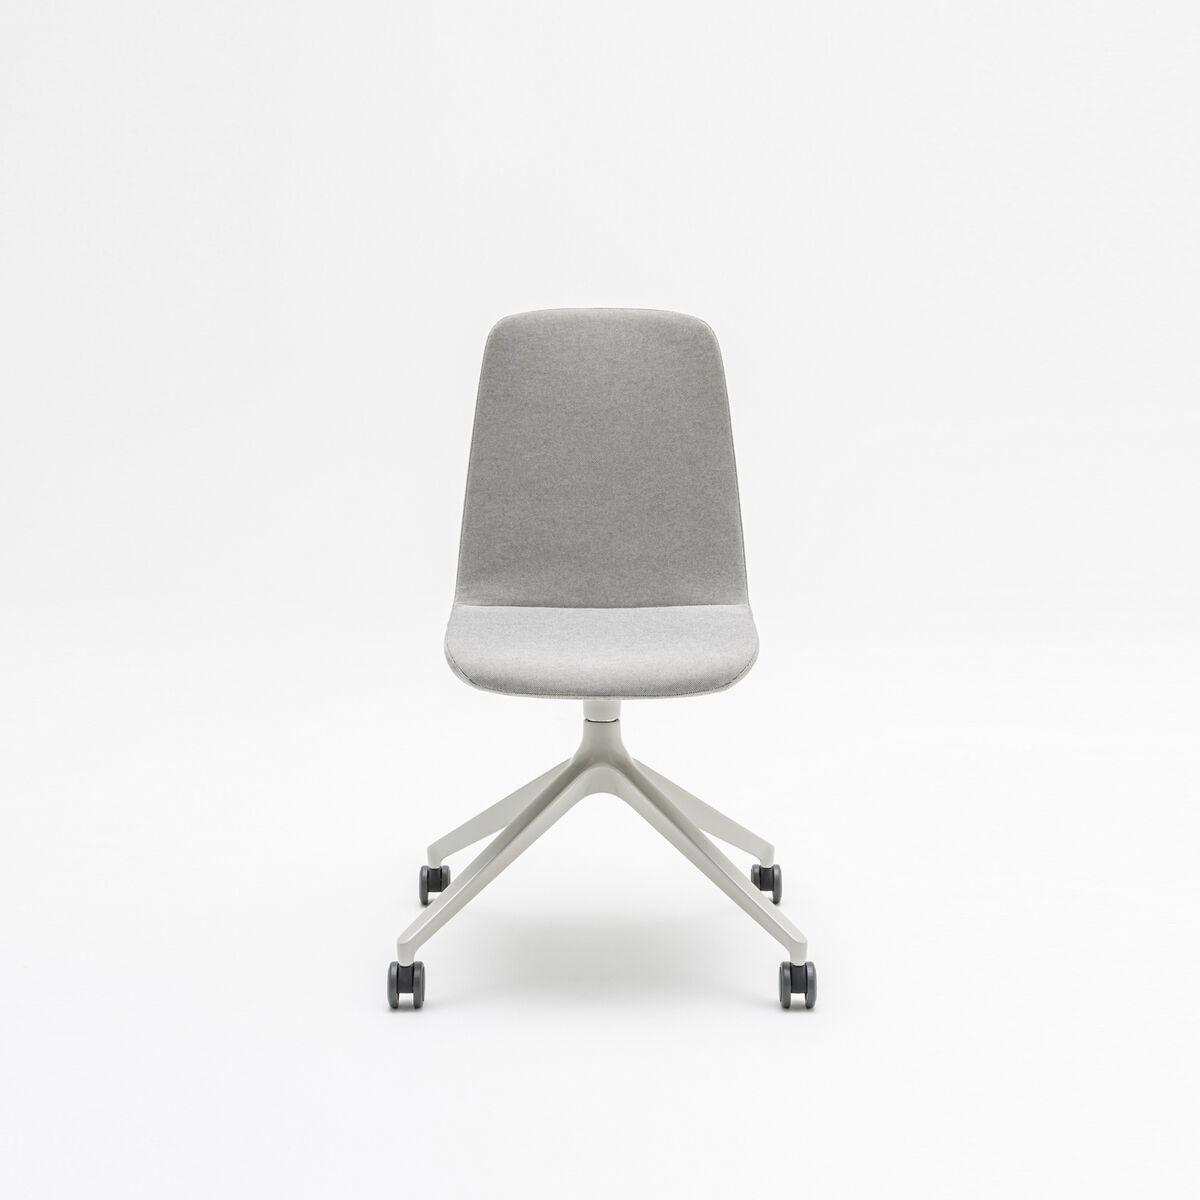 Ulti chair Fabric: Synergy colour: Lds20  Base colour:  M011